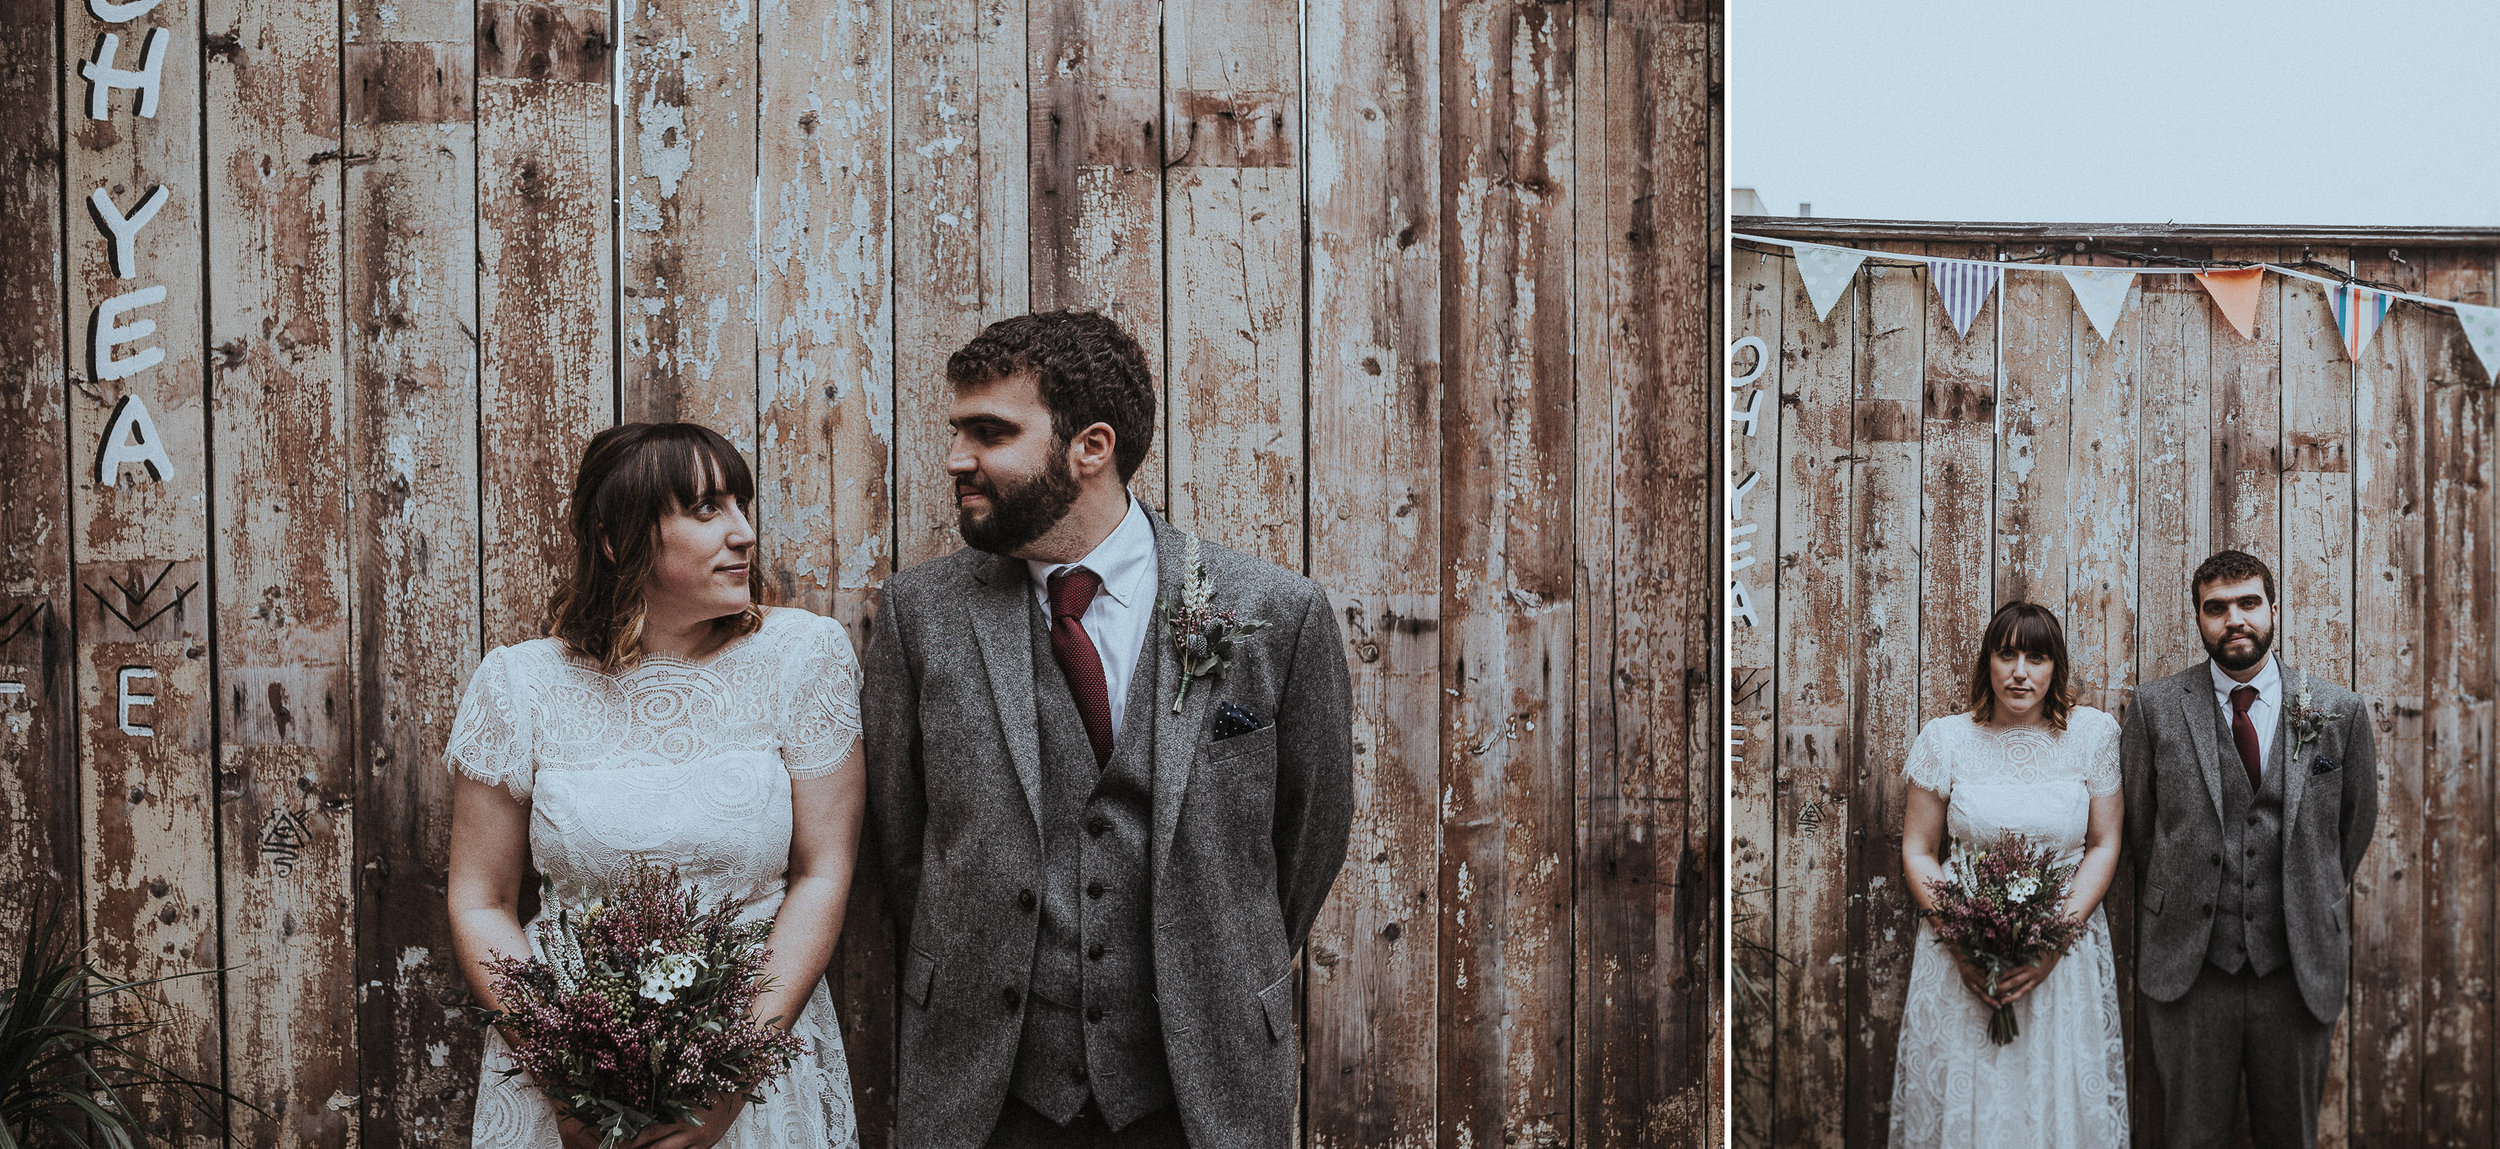 Manchester_Alternative_Wedding_Photographer-42.jpg